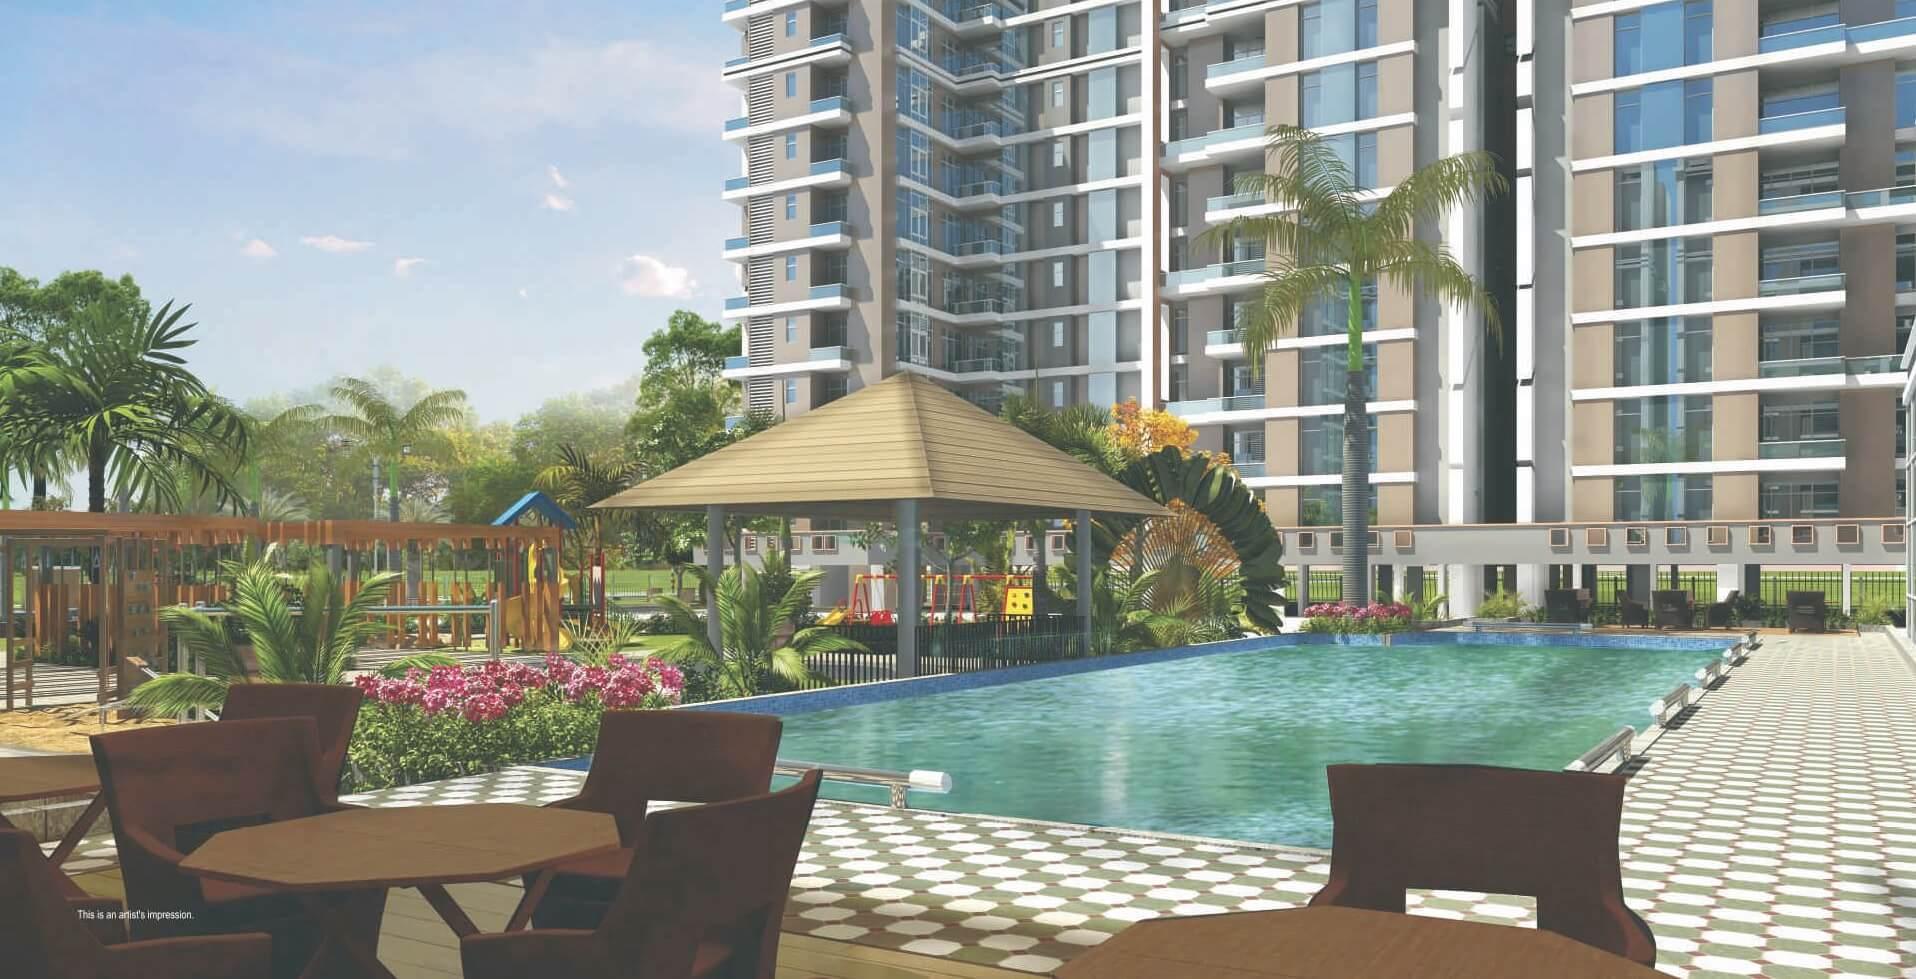 rg euphoria amenities features3